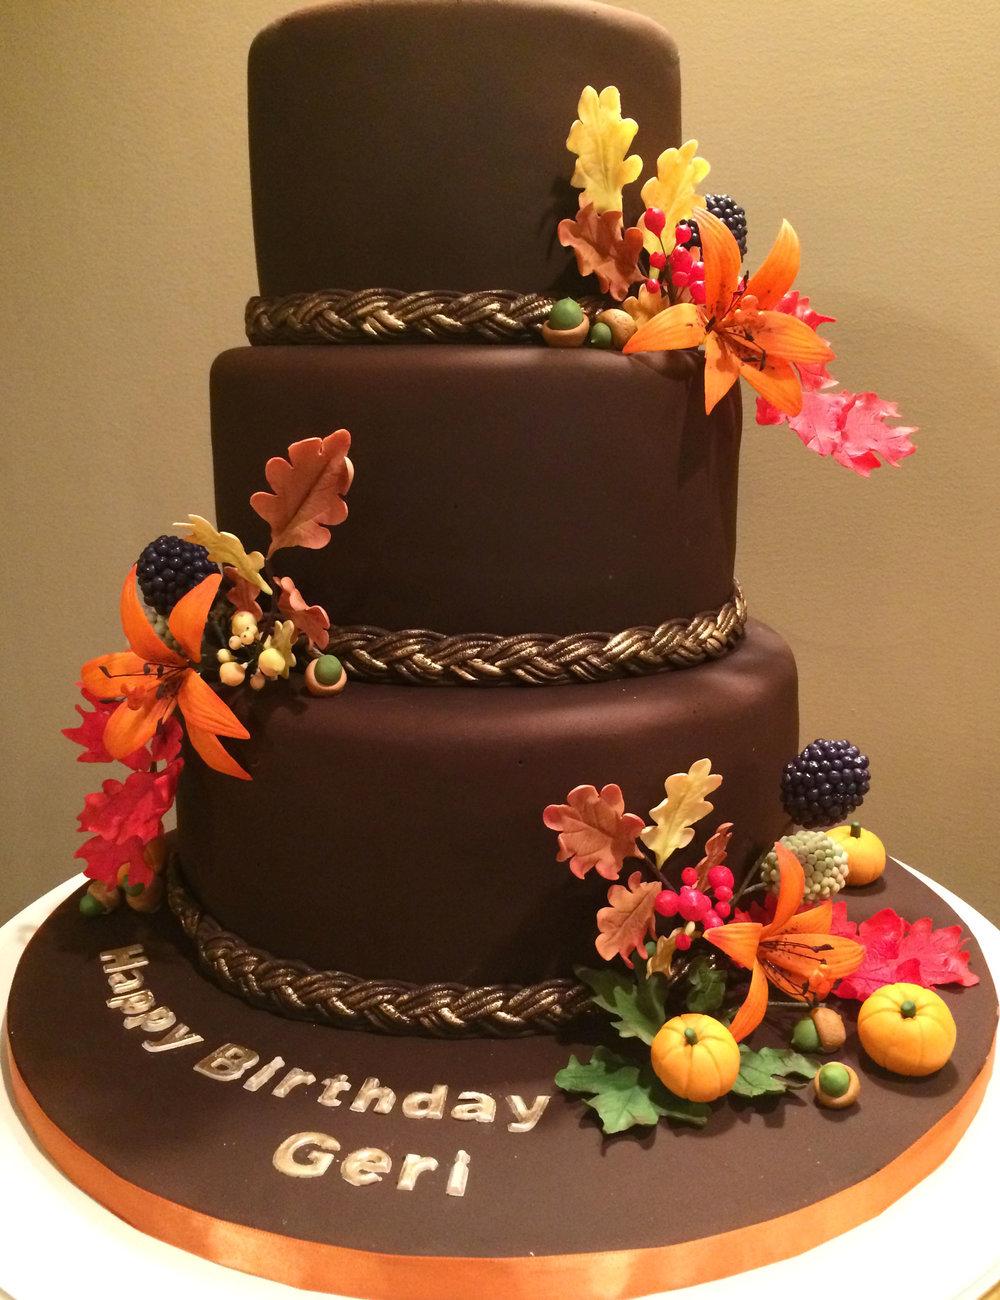 An autumn birthday celebration